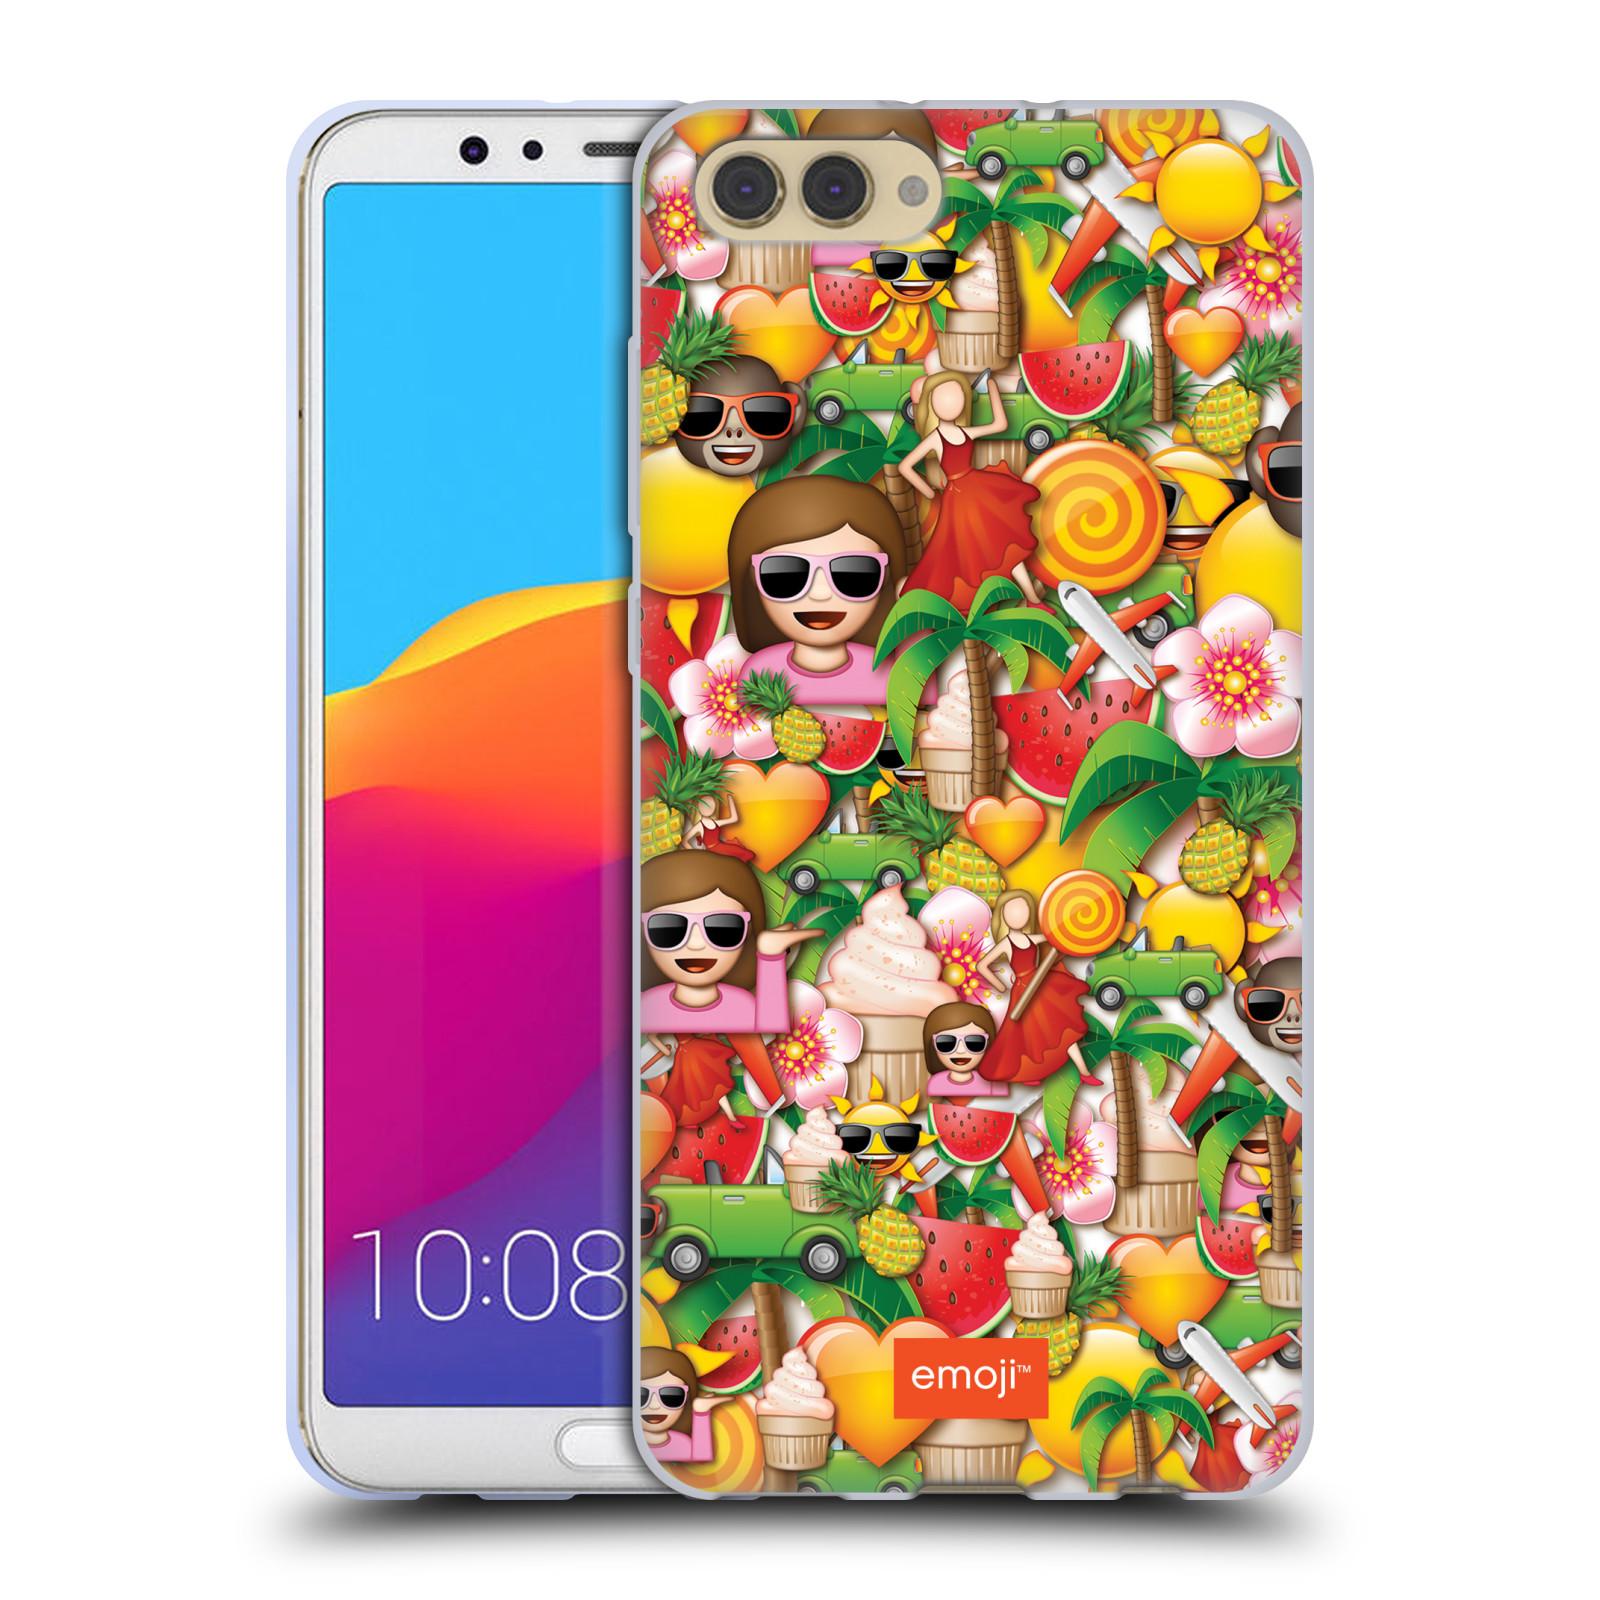 HEAD CASE silikonový obal na mobil Huawei HONOR VIEW 10 / V10 smajlíci oficiální kryt EMOJI vzor smajlící a léto